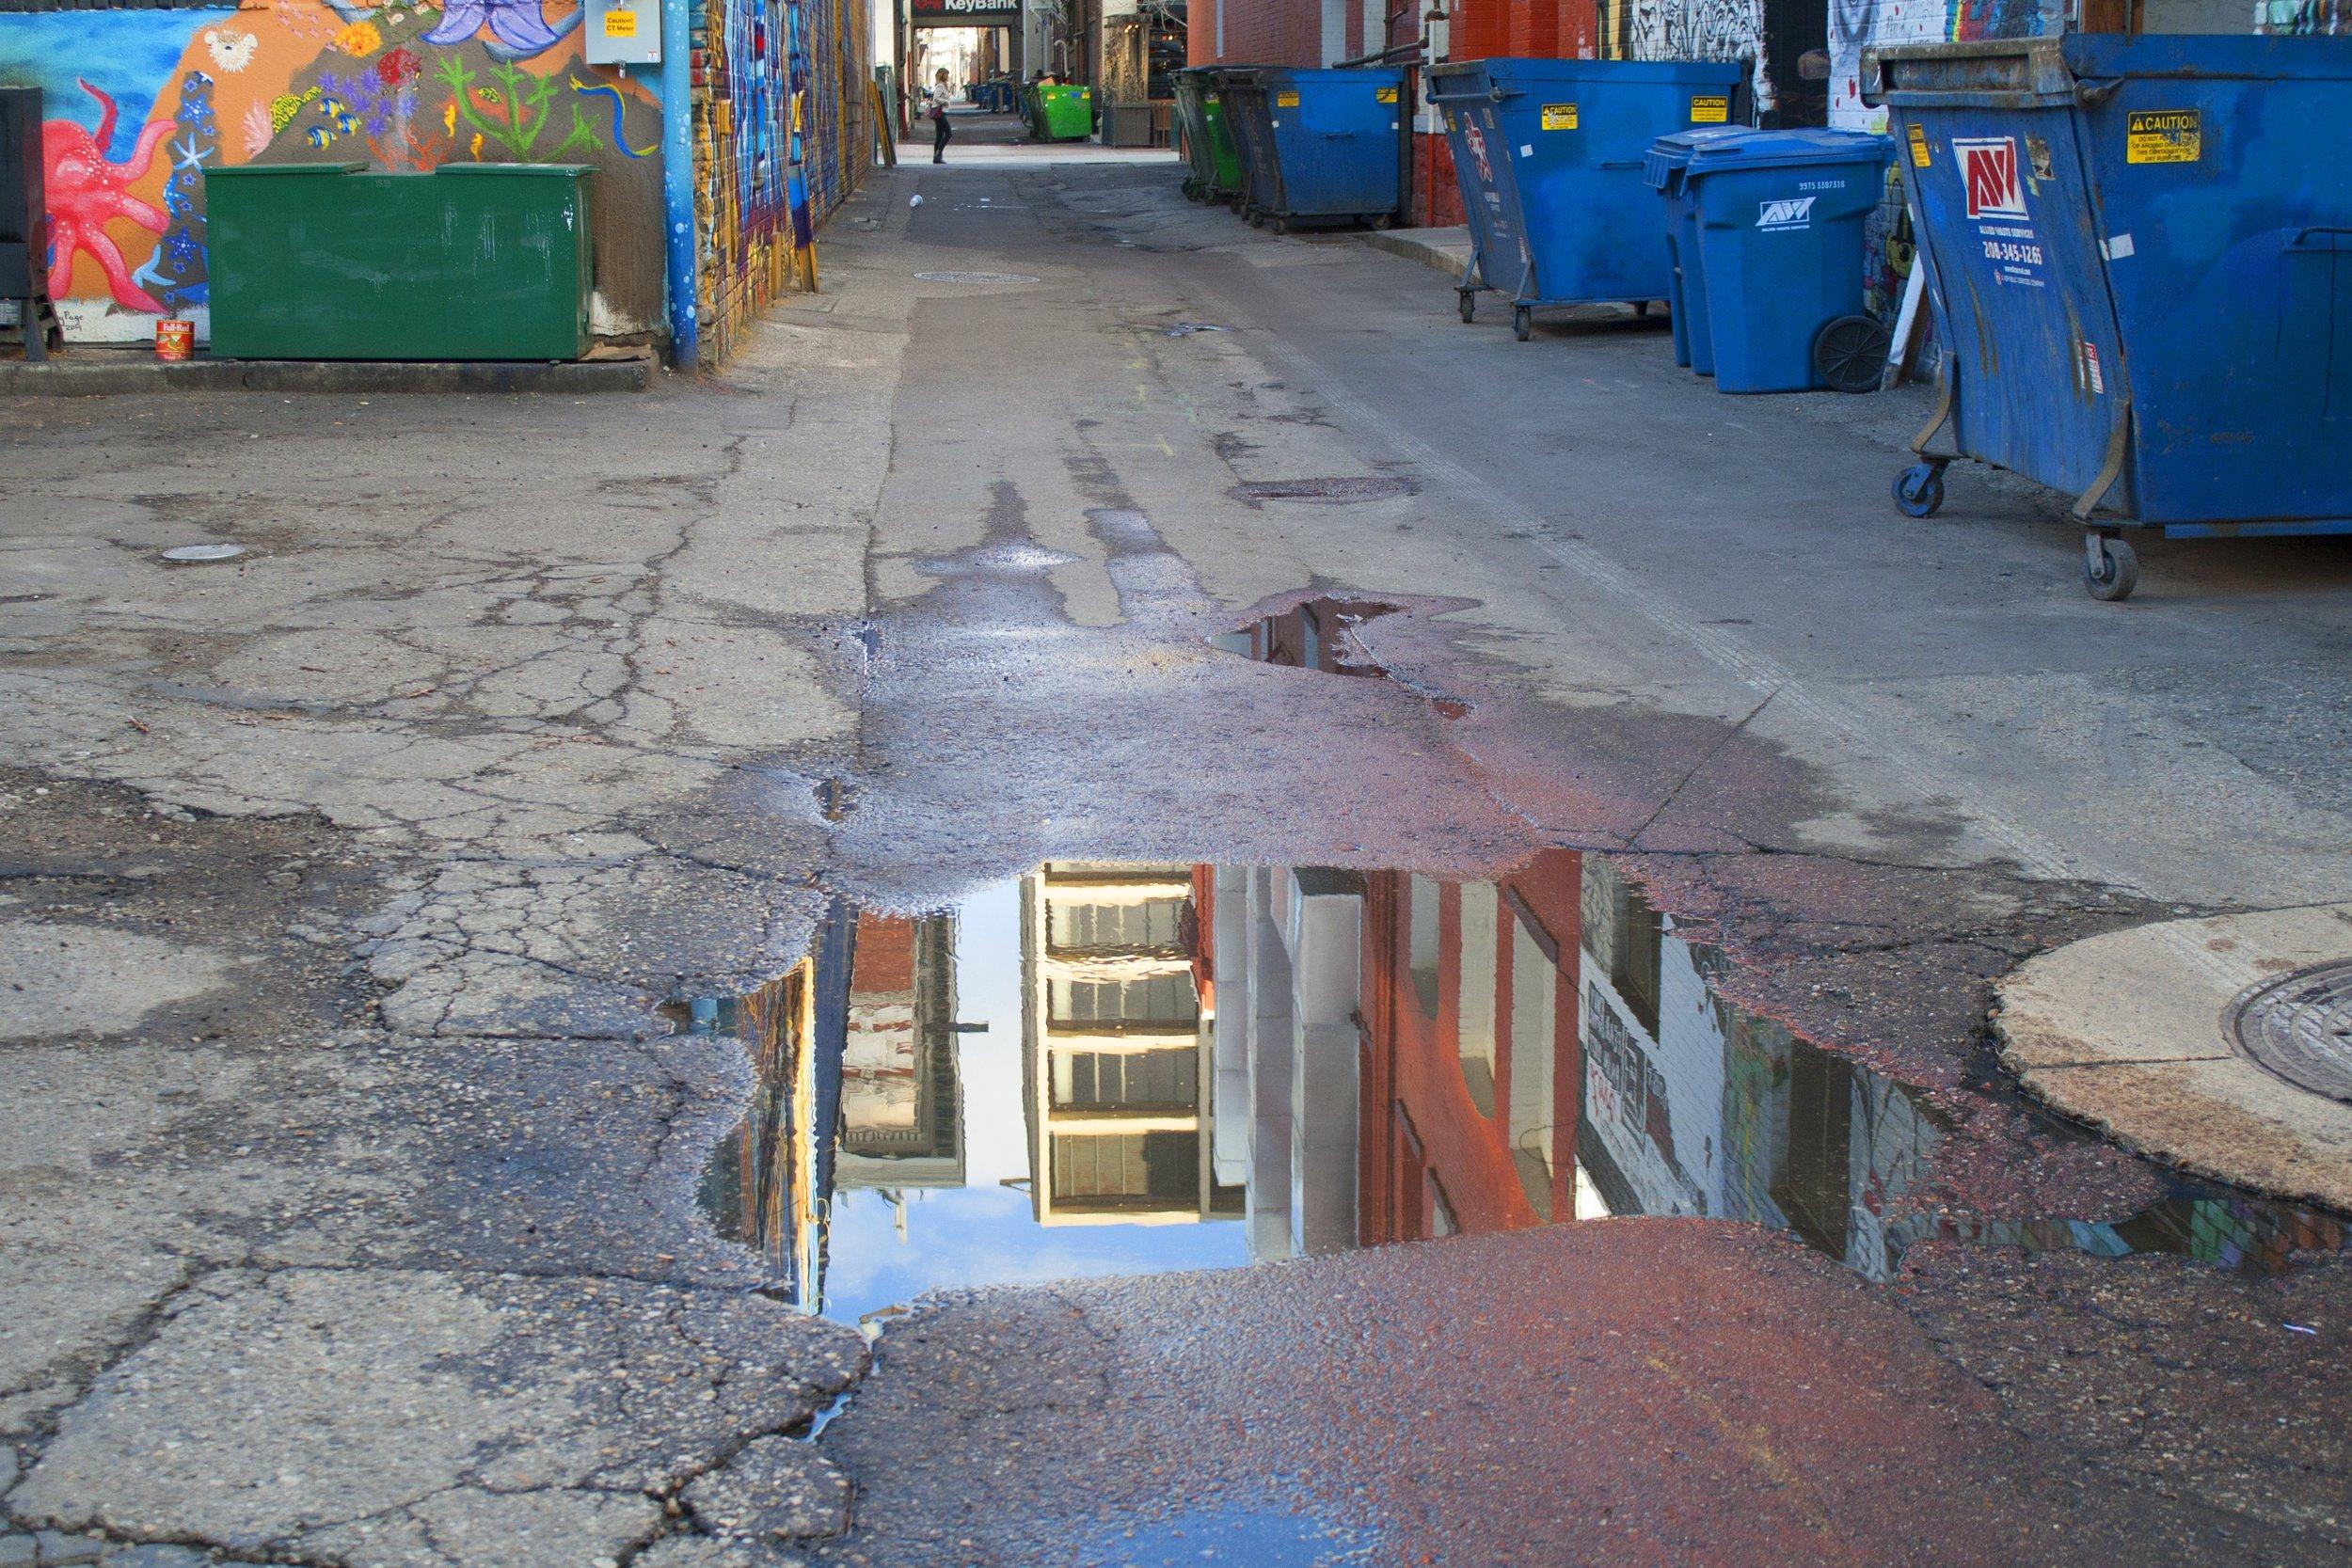 Freak-Alley-Puddle.jpg